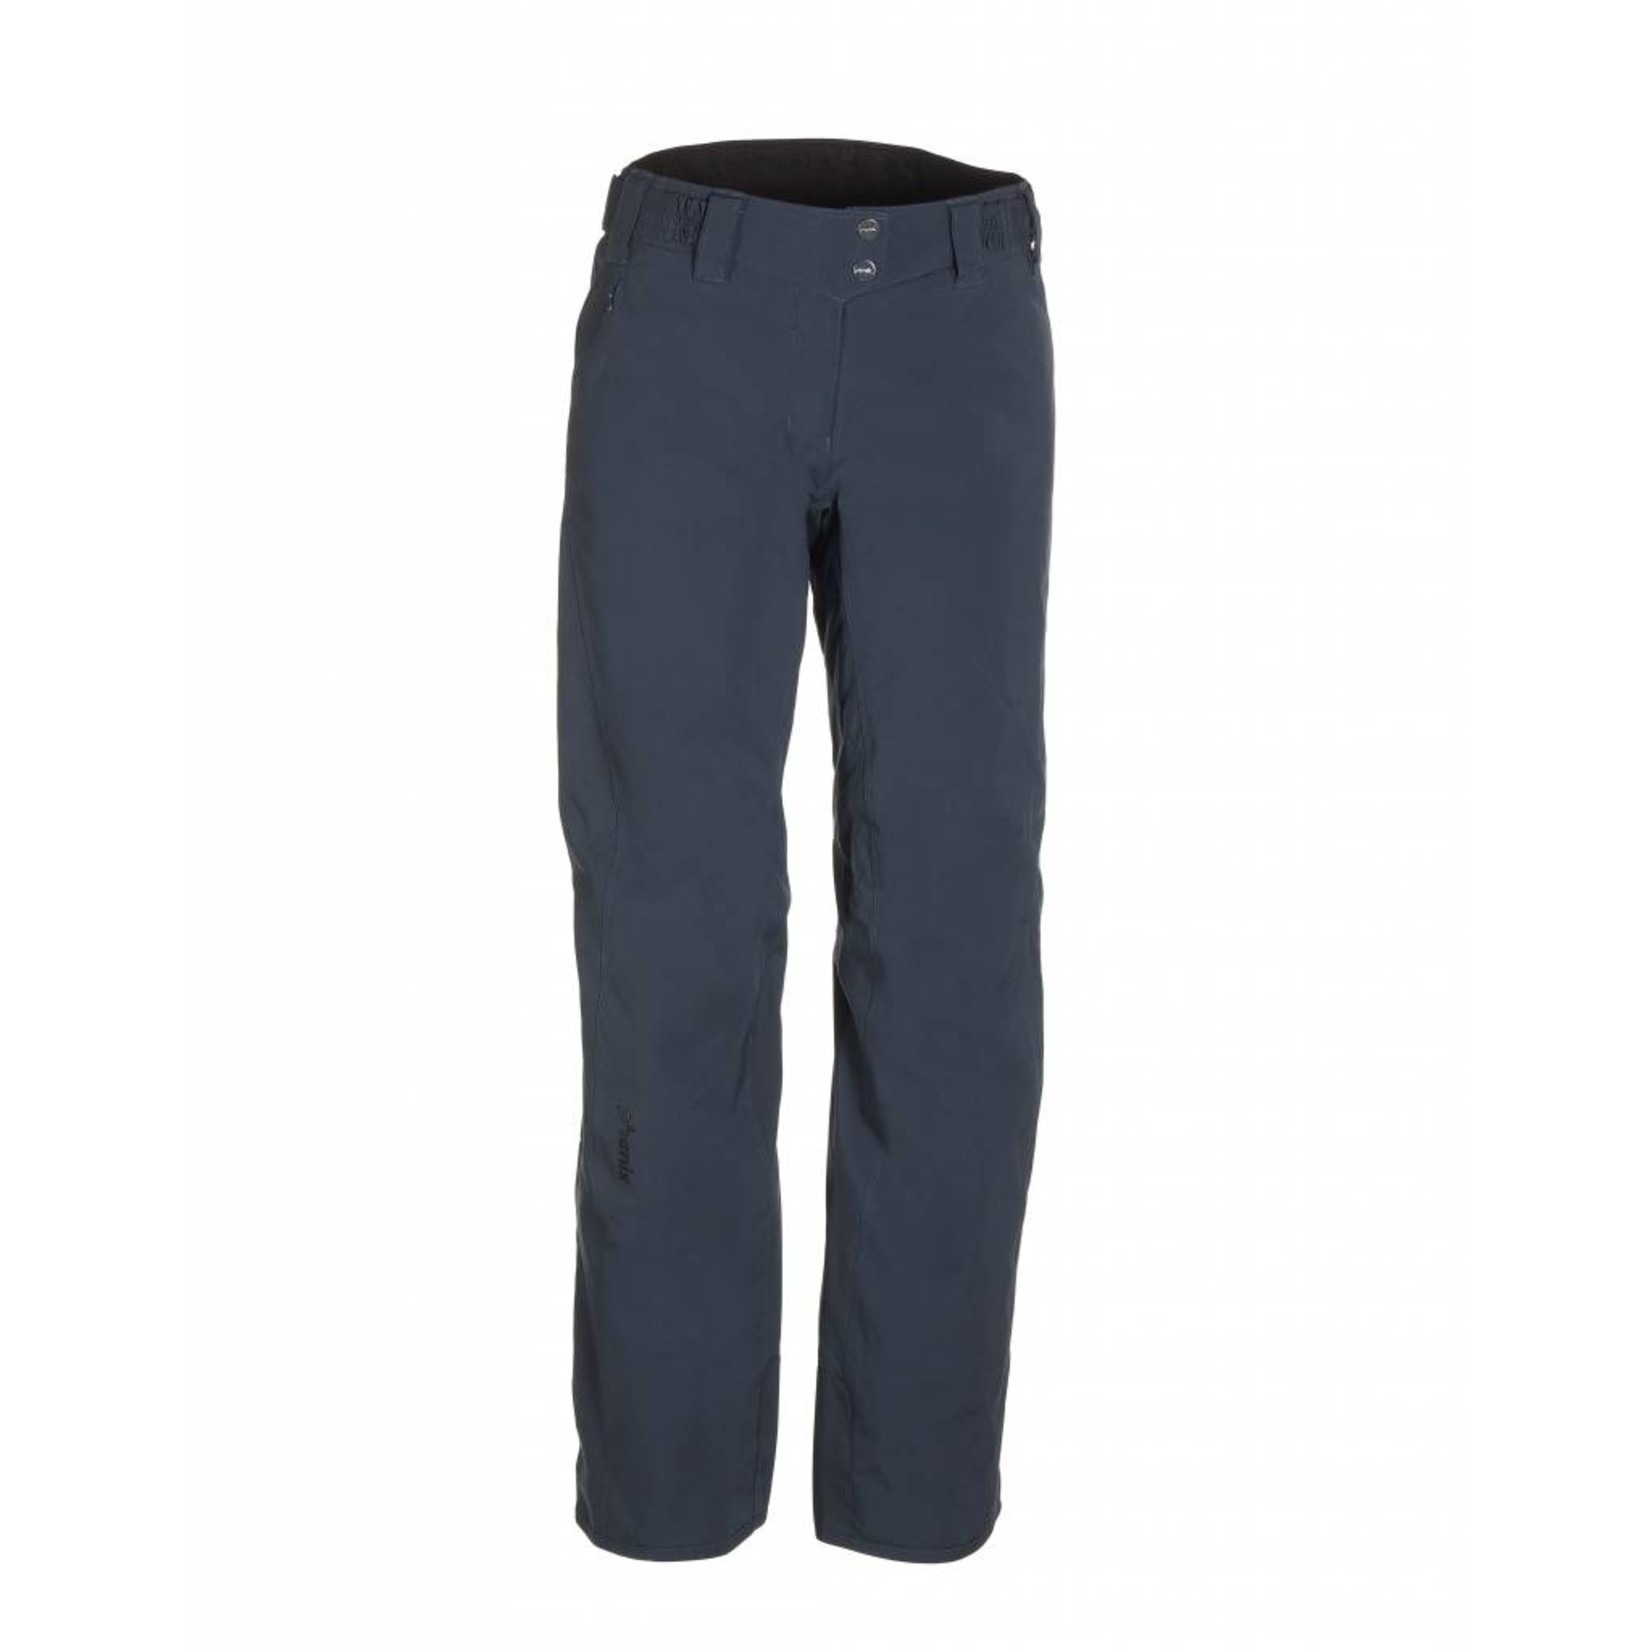 PHENIX  Orca Waist Pants - IN